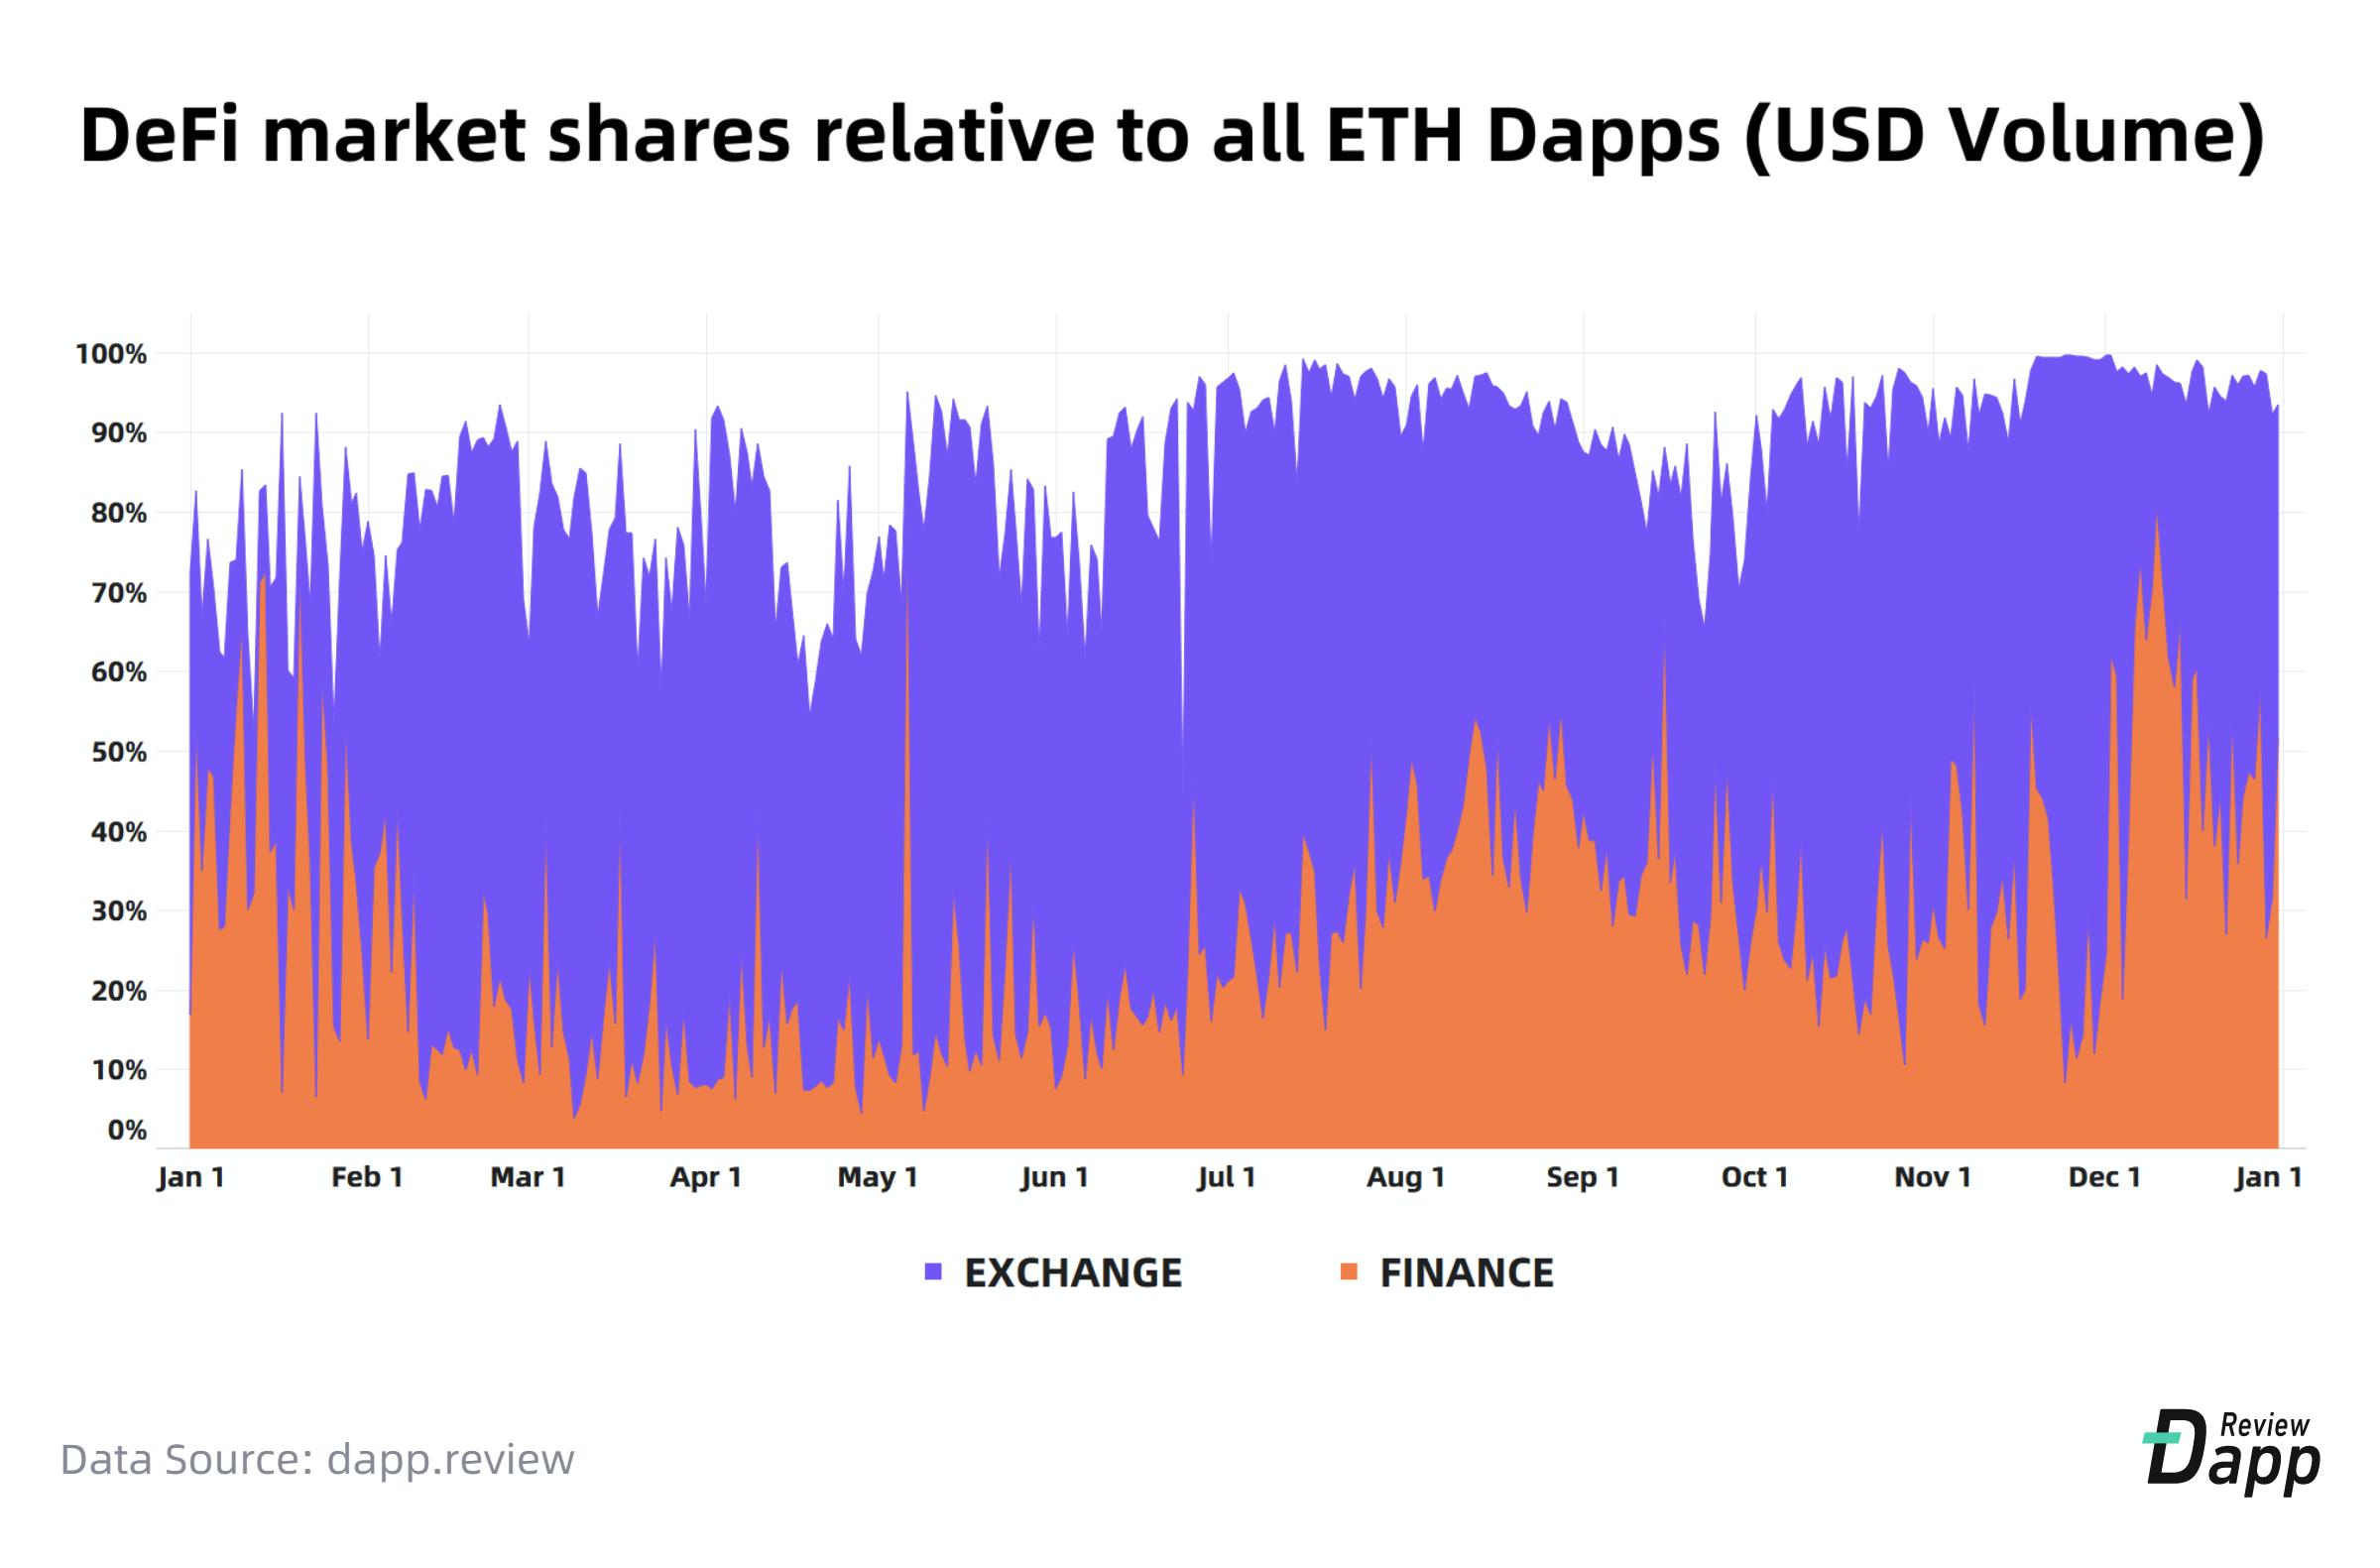 "Ethereum, Tron y EOS controlan el 98% del volumen total de Dapp ""ancho ="" 2400 ""altura ="" 1581 ""srcset ="" https://blackswanfinances.com/wp-content/uploads/2020/01/defi.png 2400w, https://news.bitcoin.com/wp-content/uploads/2020/01/defi-300x198.png 300w, https://news.bitcoin.com/wp-content/uploads/2020/01/defi-1024x675.png 1024w, https://news.bitcoin.com/wp-content/uploads/2020/01/defi -768x506.png 768w, https://news.bitcoin.com/wp-content/uploads/2020/01/defi-1536x1012.png 1536w, https://news.bitcoin.com/wp-content/uploads/2020 /01/defi-2048x1349.png 2048w, https://news.bitcoin.com/wp-content/uploads/2020/01/defi-696x458.png 696w, https://news.bitcoin.com/wp-content /uploads/2020/01/defi-1392x917.png 1392w, https://news.bitcoin.com/wp-content/uploads/2020/01/defi-1068x704.png 1068w, https://news.bitcoin.com /wp-content/uploads/2020/01/defi-638x420.png 638w, https://news.bitcoin.com/wp-conte nt / uploads / 2020/01 / defi-1920x1265.png 1920w ""tamaños ="" (ancho máximo: 2400px) 100vw, 2400px"